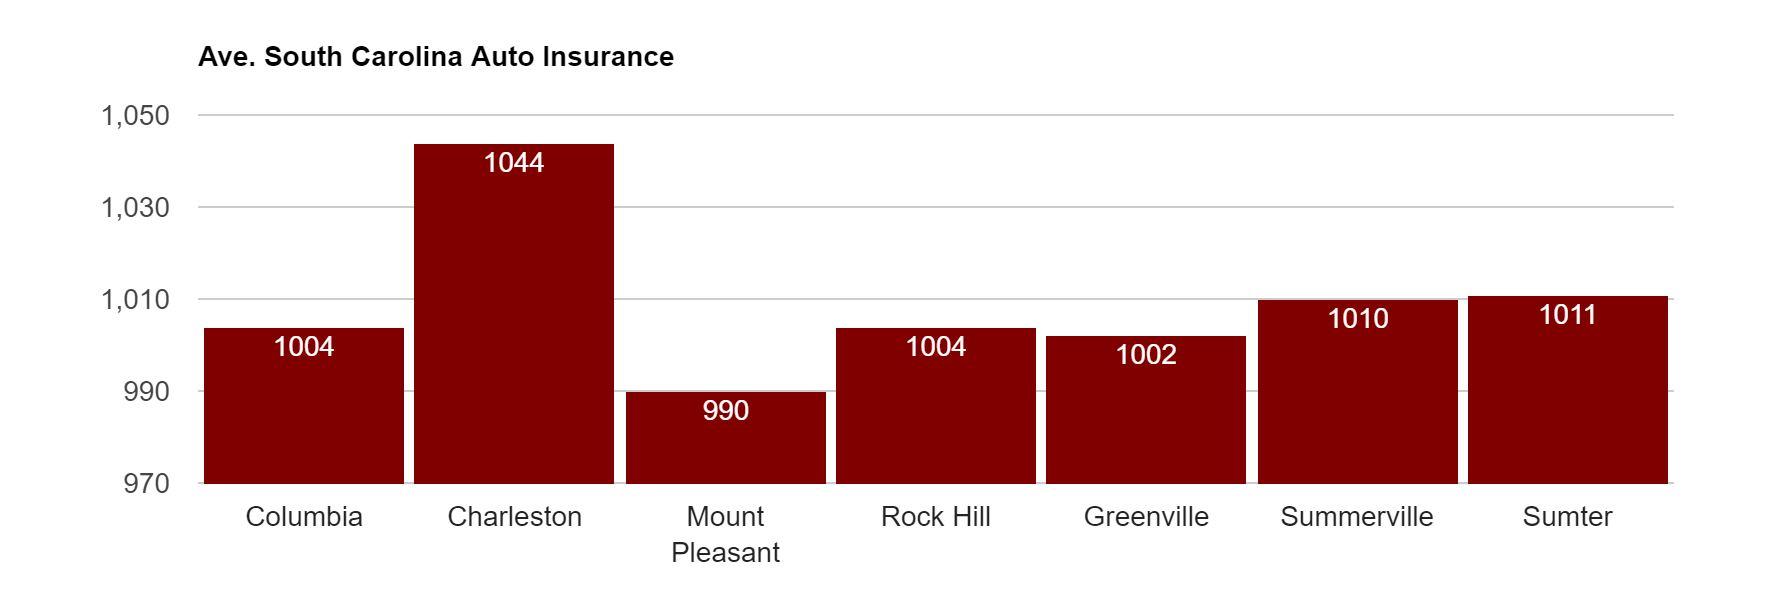 Average South Carolina Auto Insurance